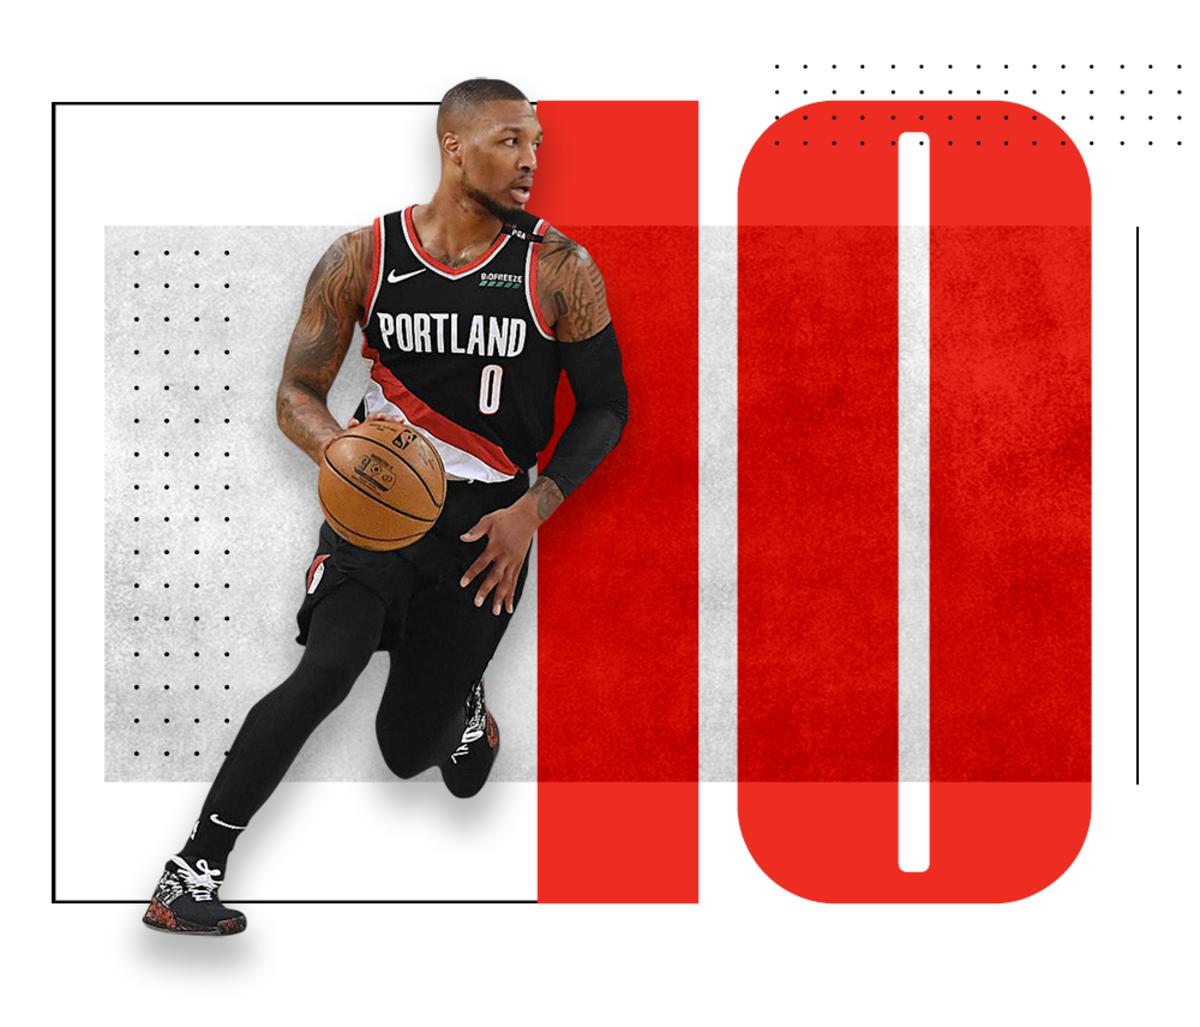 top-100-nba-players-2020-Damian-Lillard.png